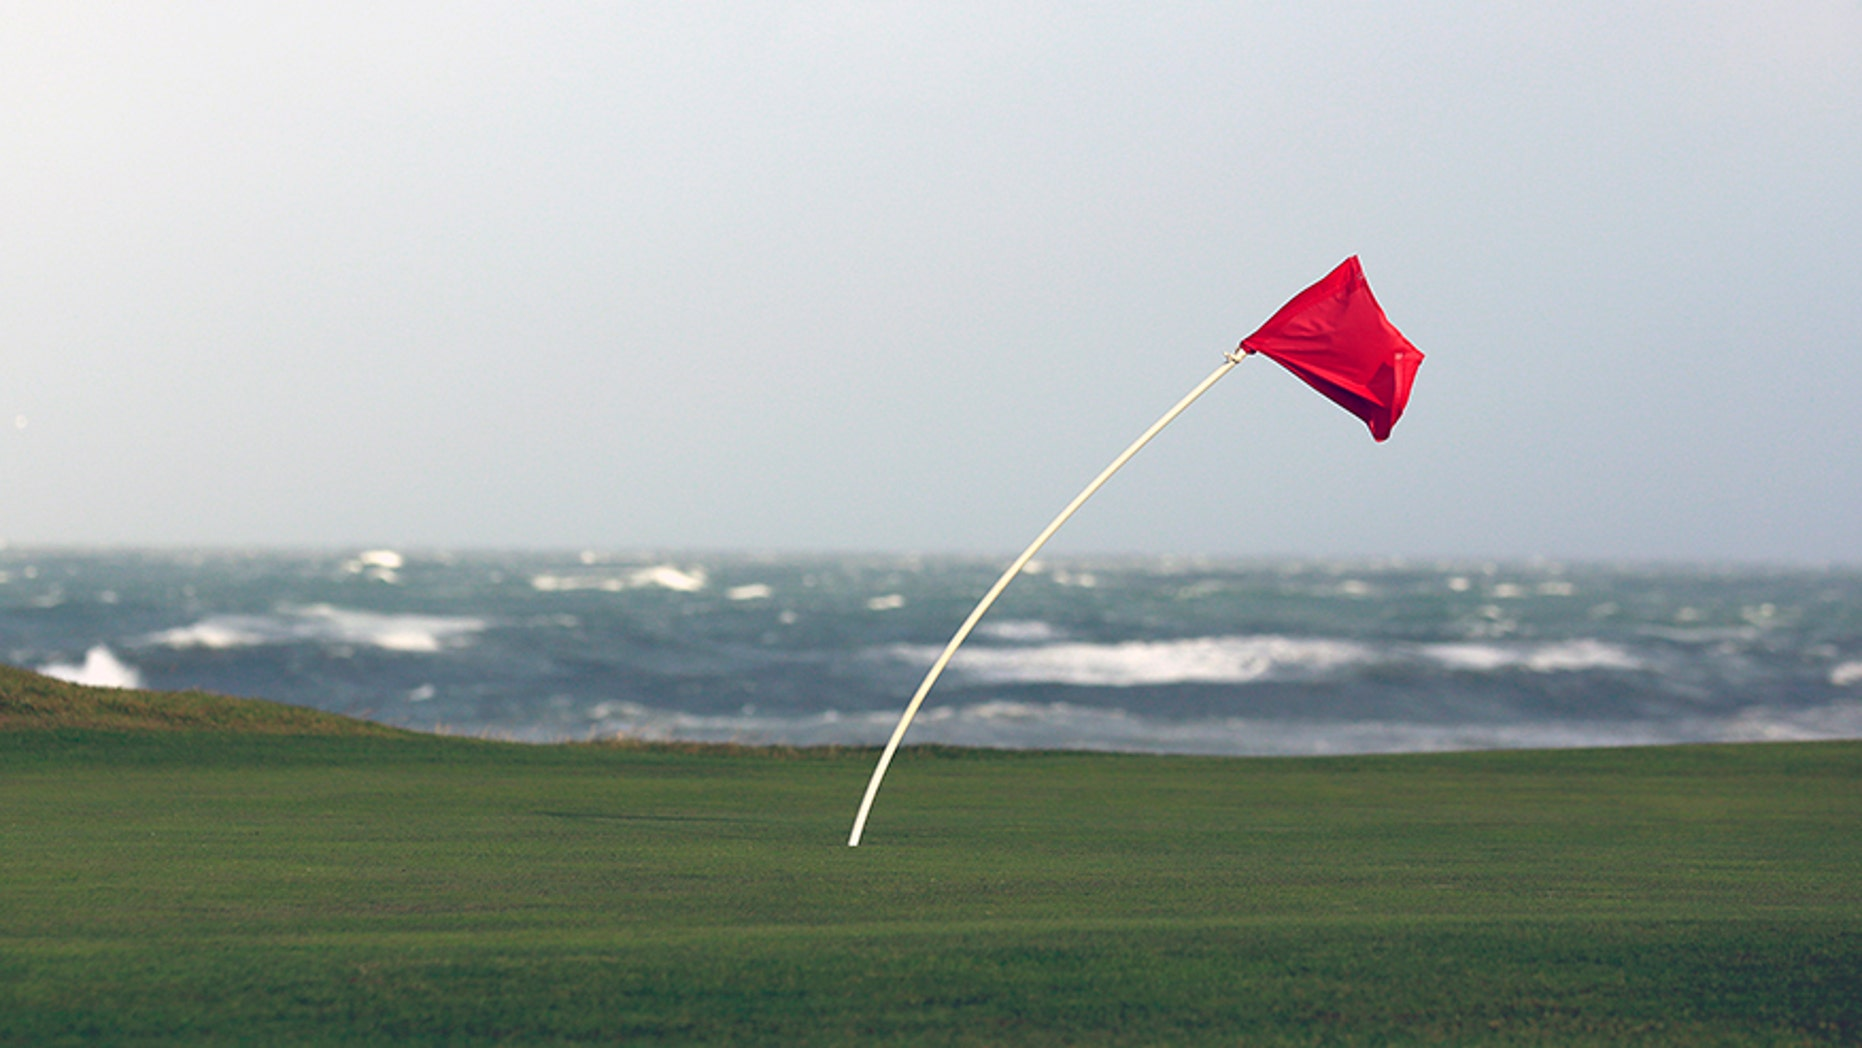 A South Carolina couple was caught having sexual intercourse on a golf course.